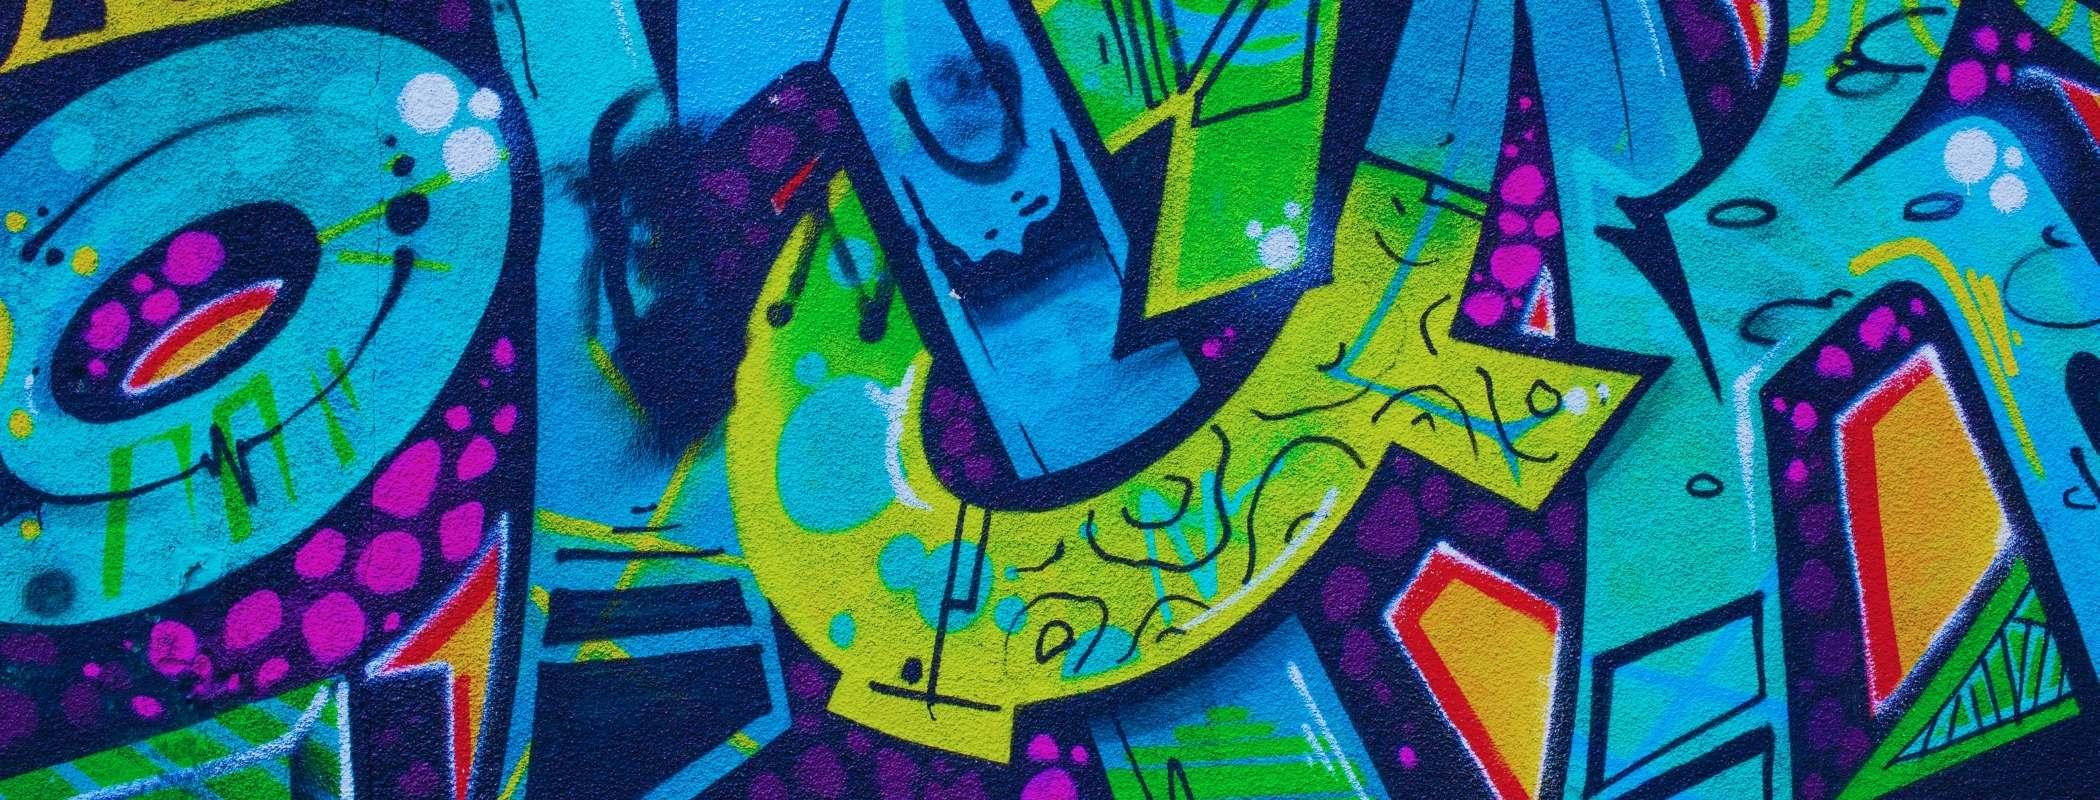 removing graffiti with pressure washer